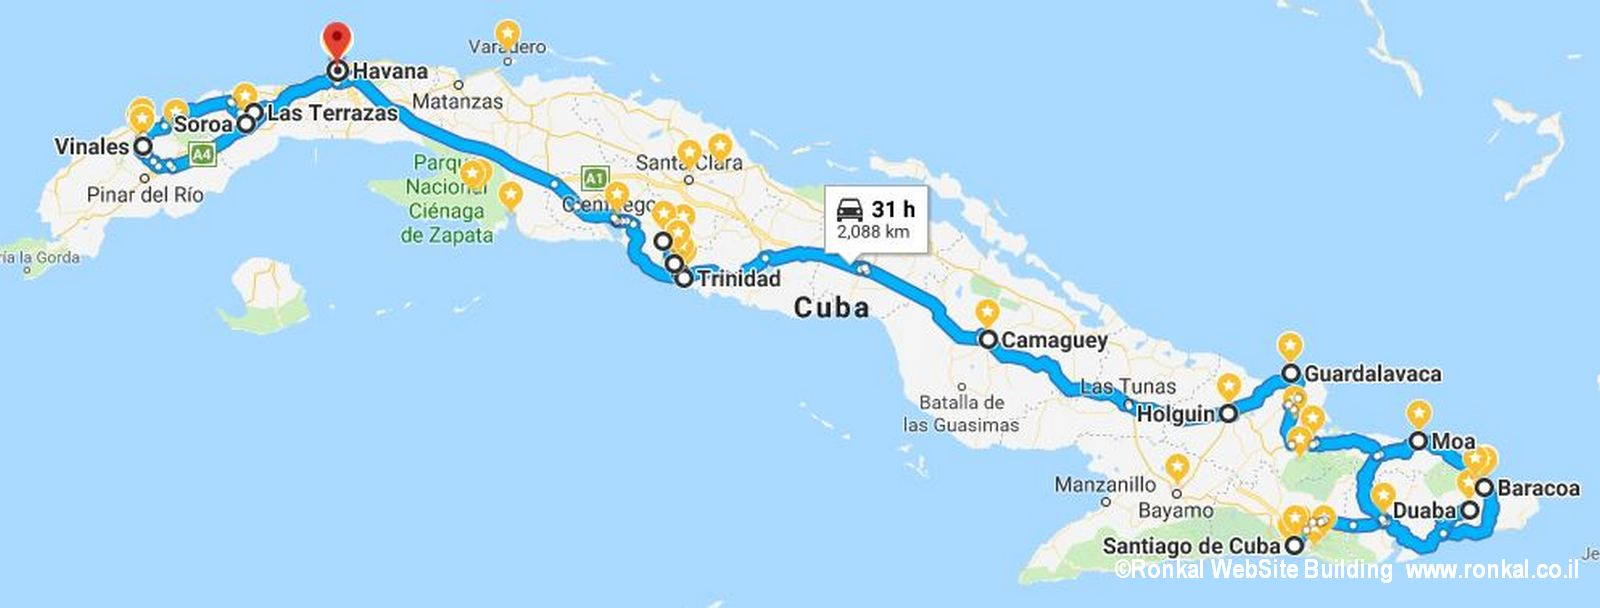 cuba_map_track